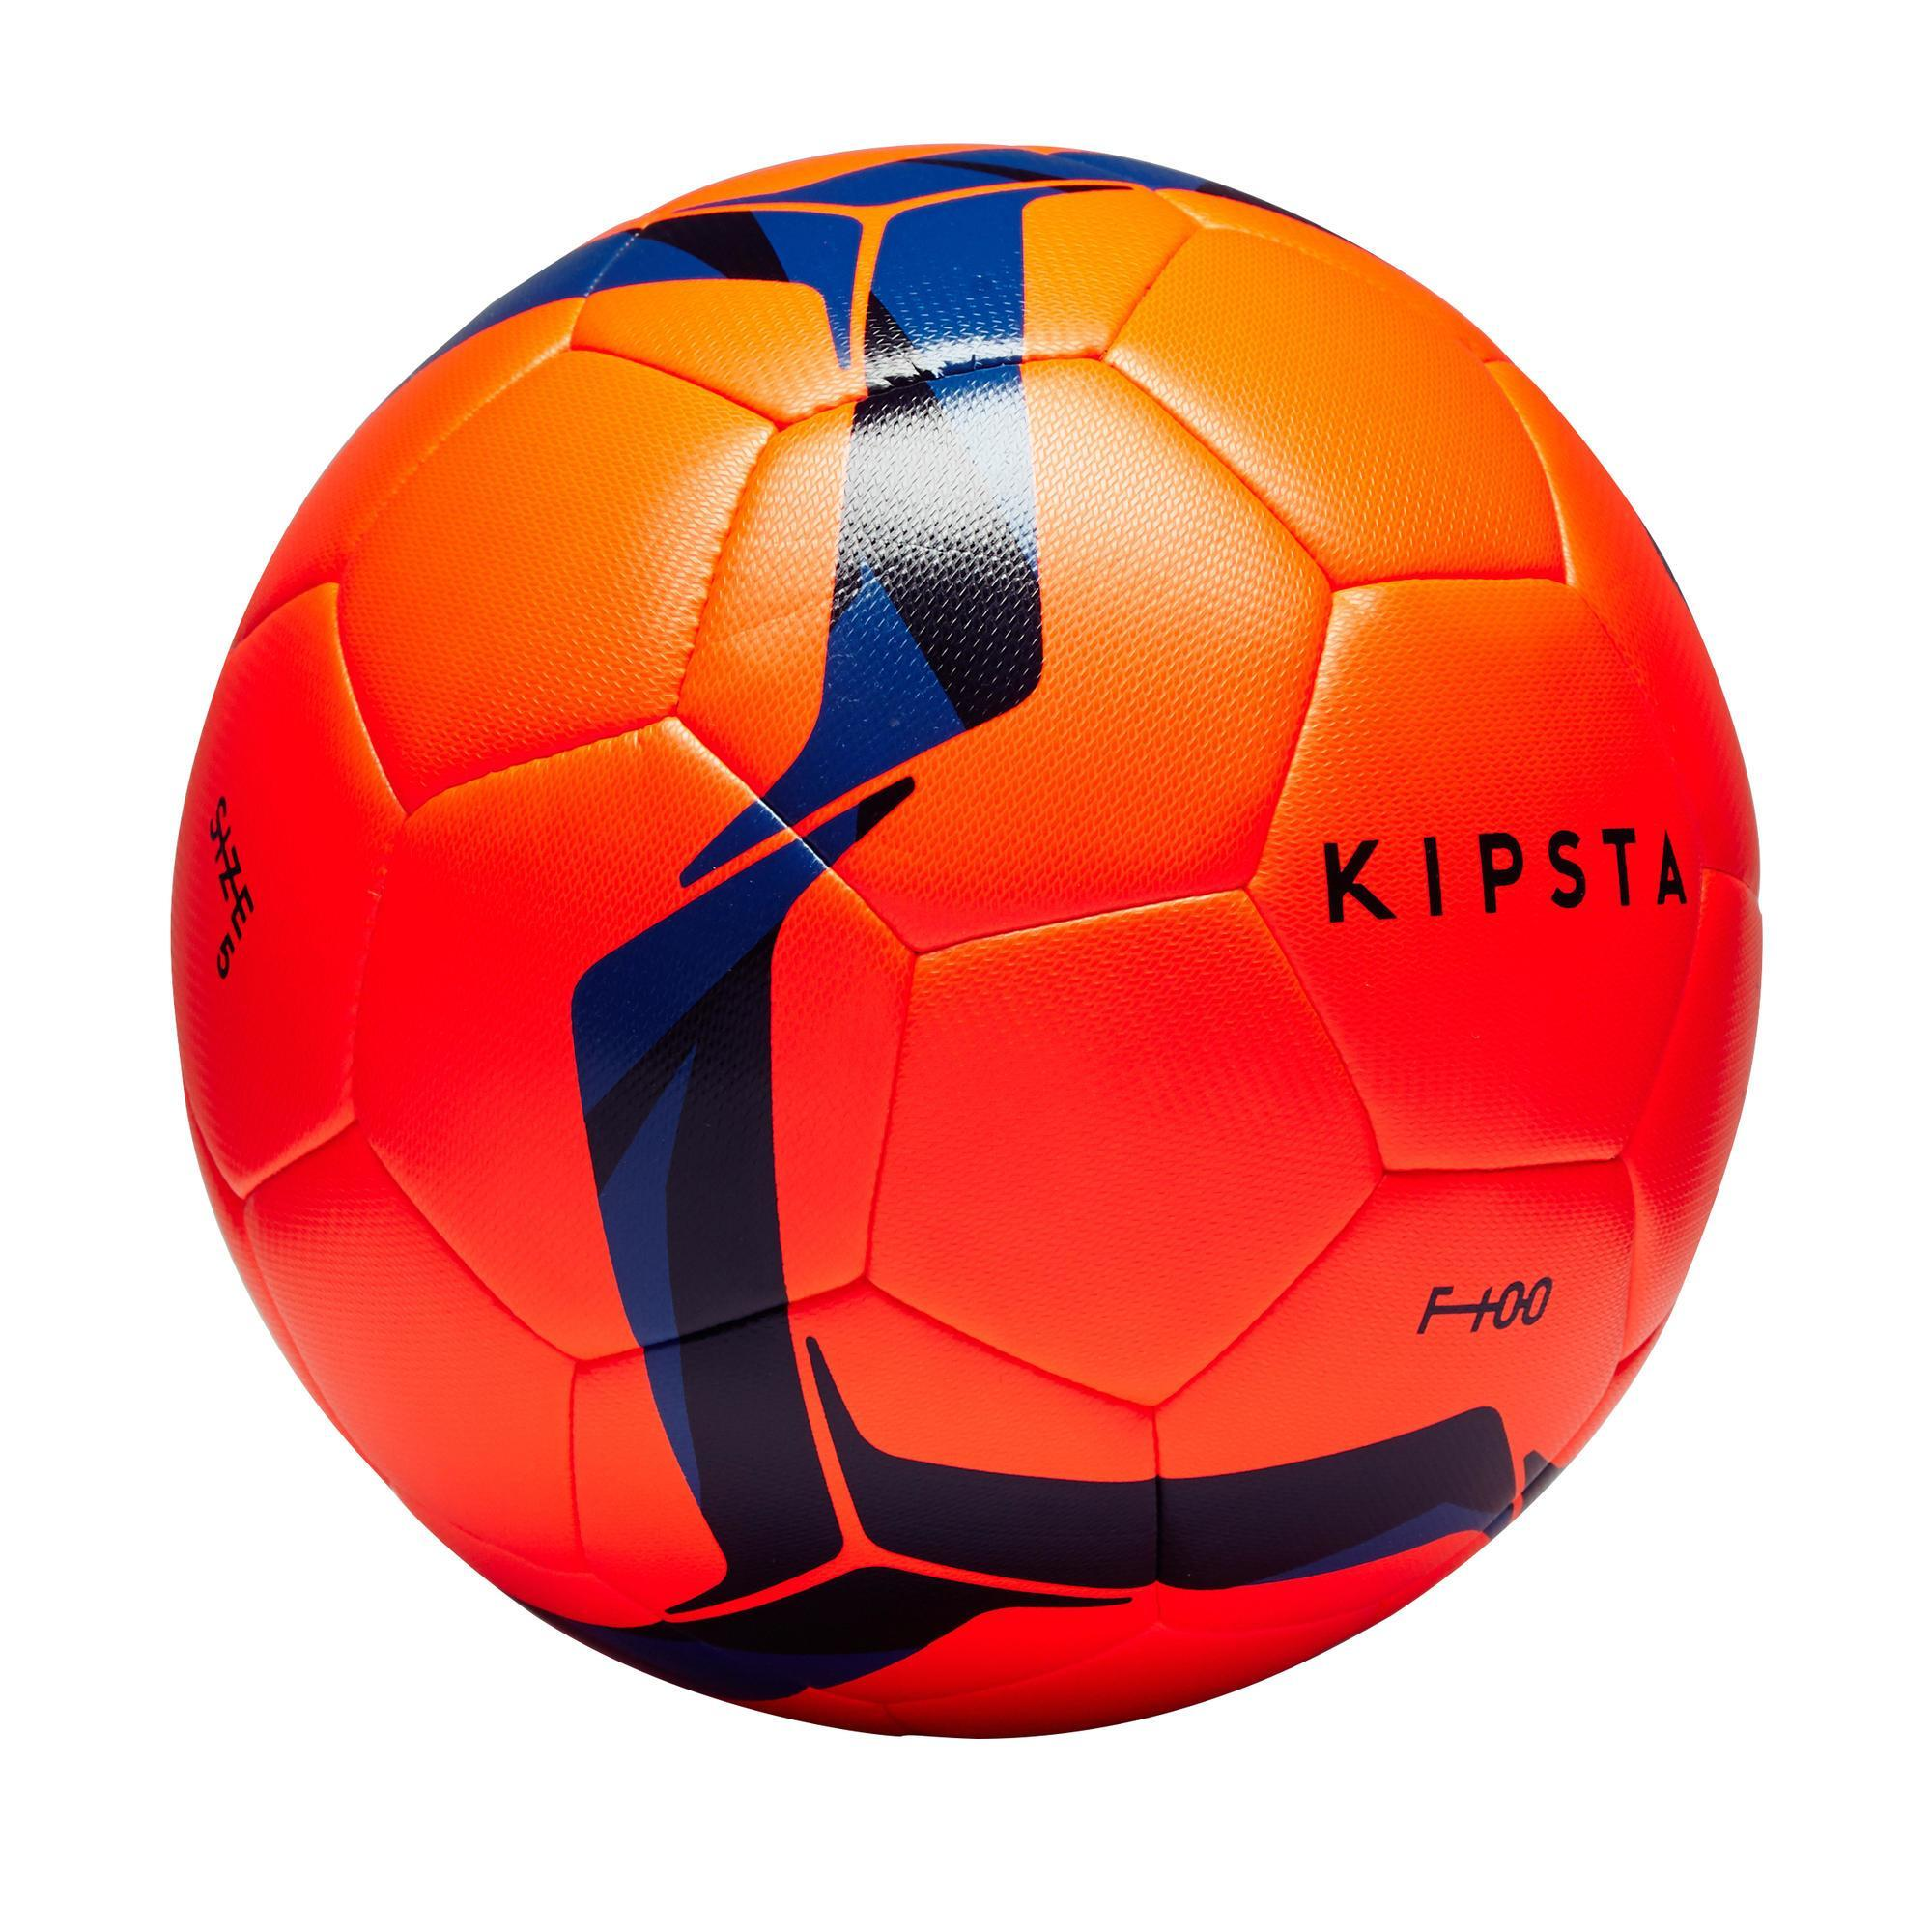 7c5f3f068b373 Balón de fútbol híbrido talla blanco kipsta decathlon jpg 700x700 Decathlon  caña alto taco fútbol